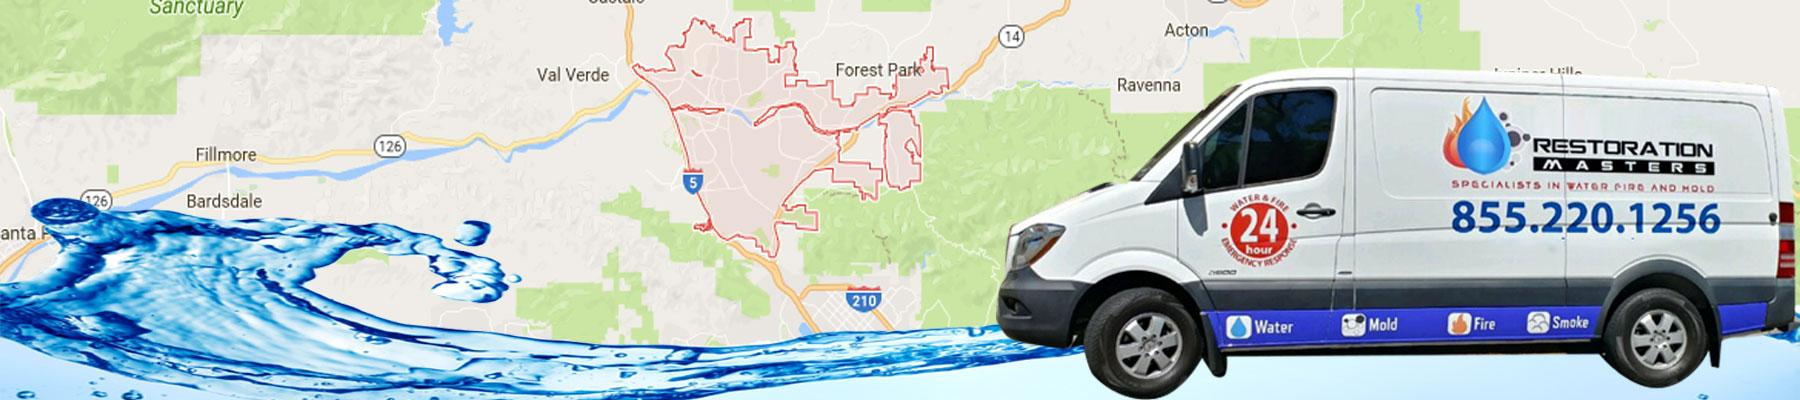 Water Damage Services Santa Clarita, Californa | Restoration